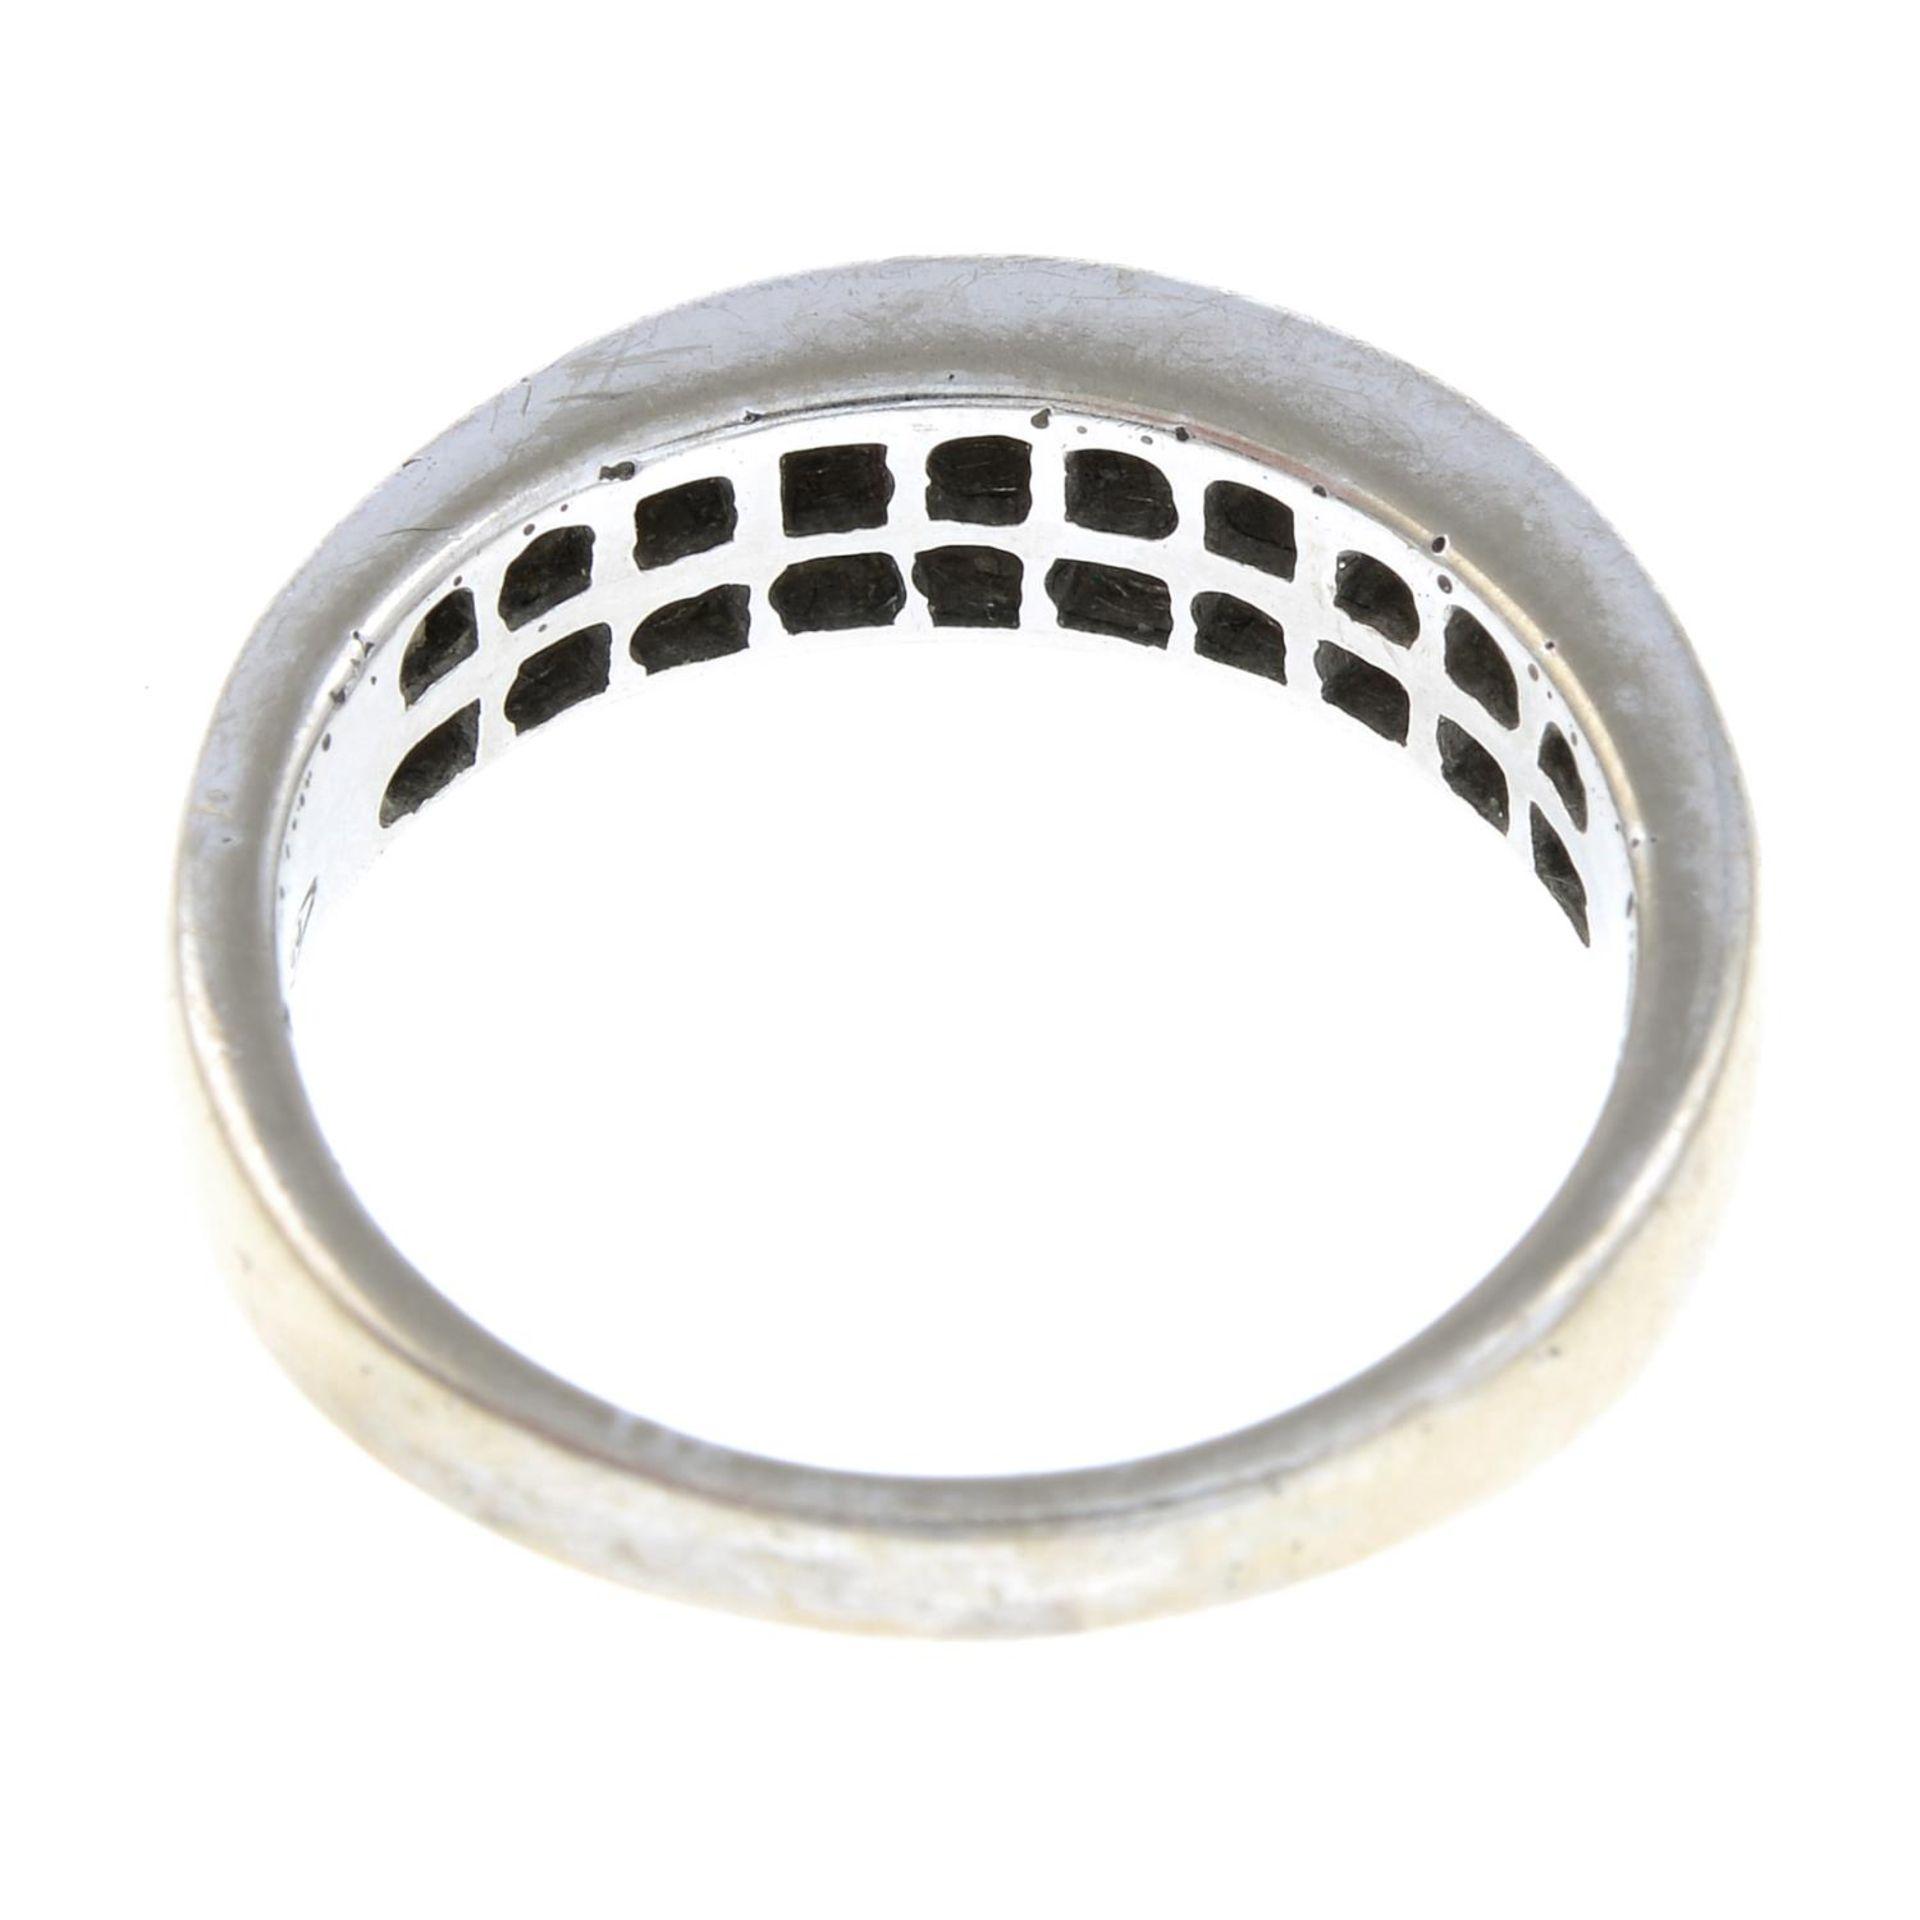 A brilliant-cut diamond two-row half eternity ring.Estimated total diamond weight 0.6c0t. - Bild 3 aus 3